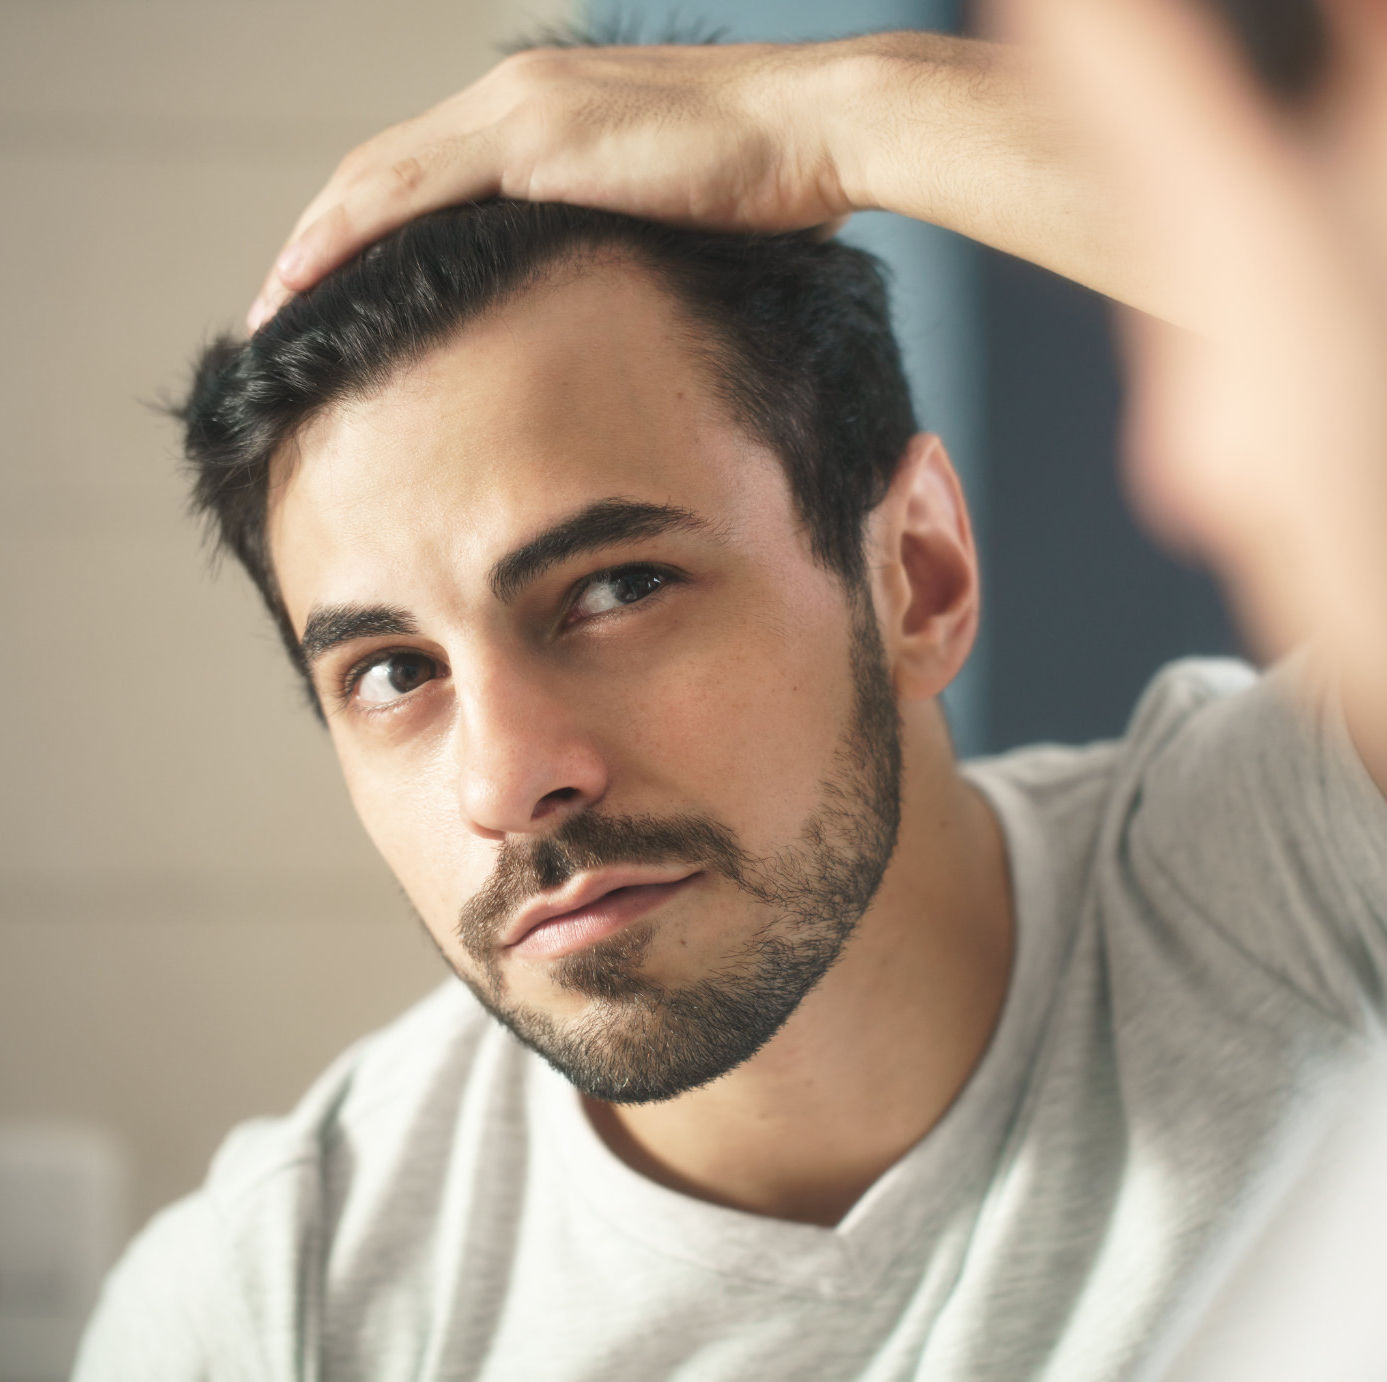 Man looking in mirror at hair